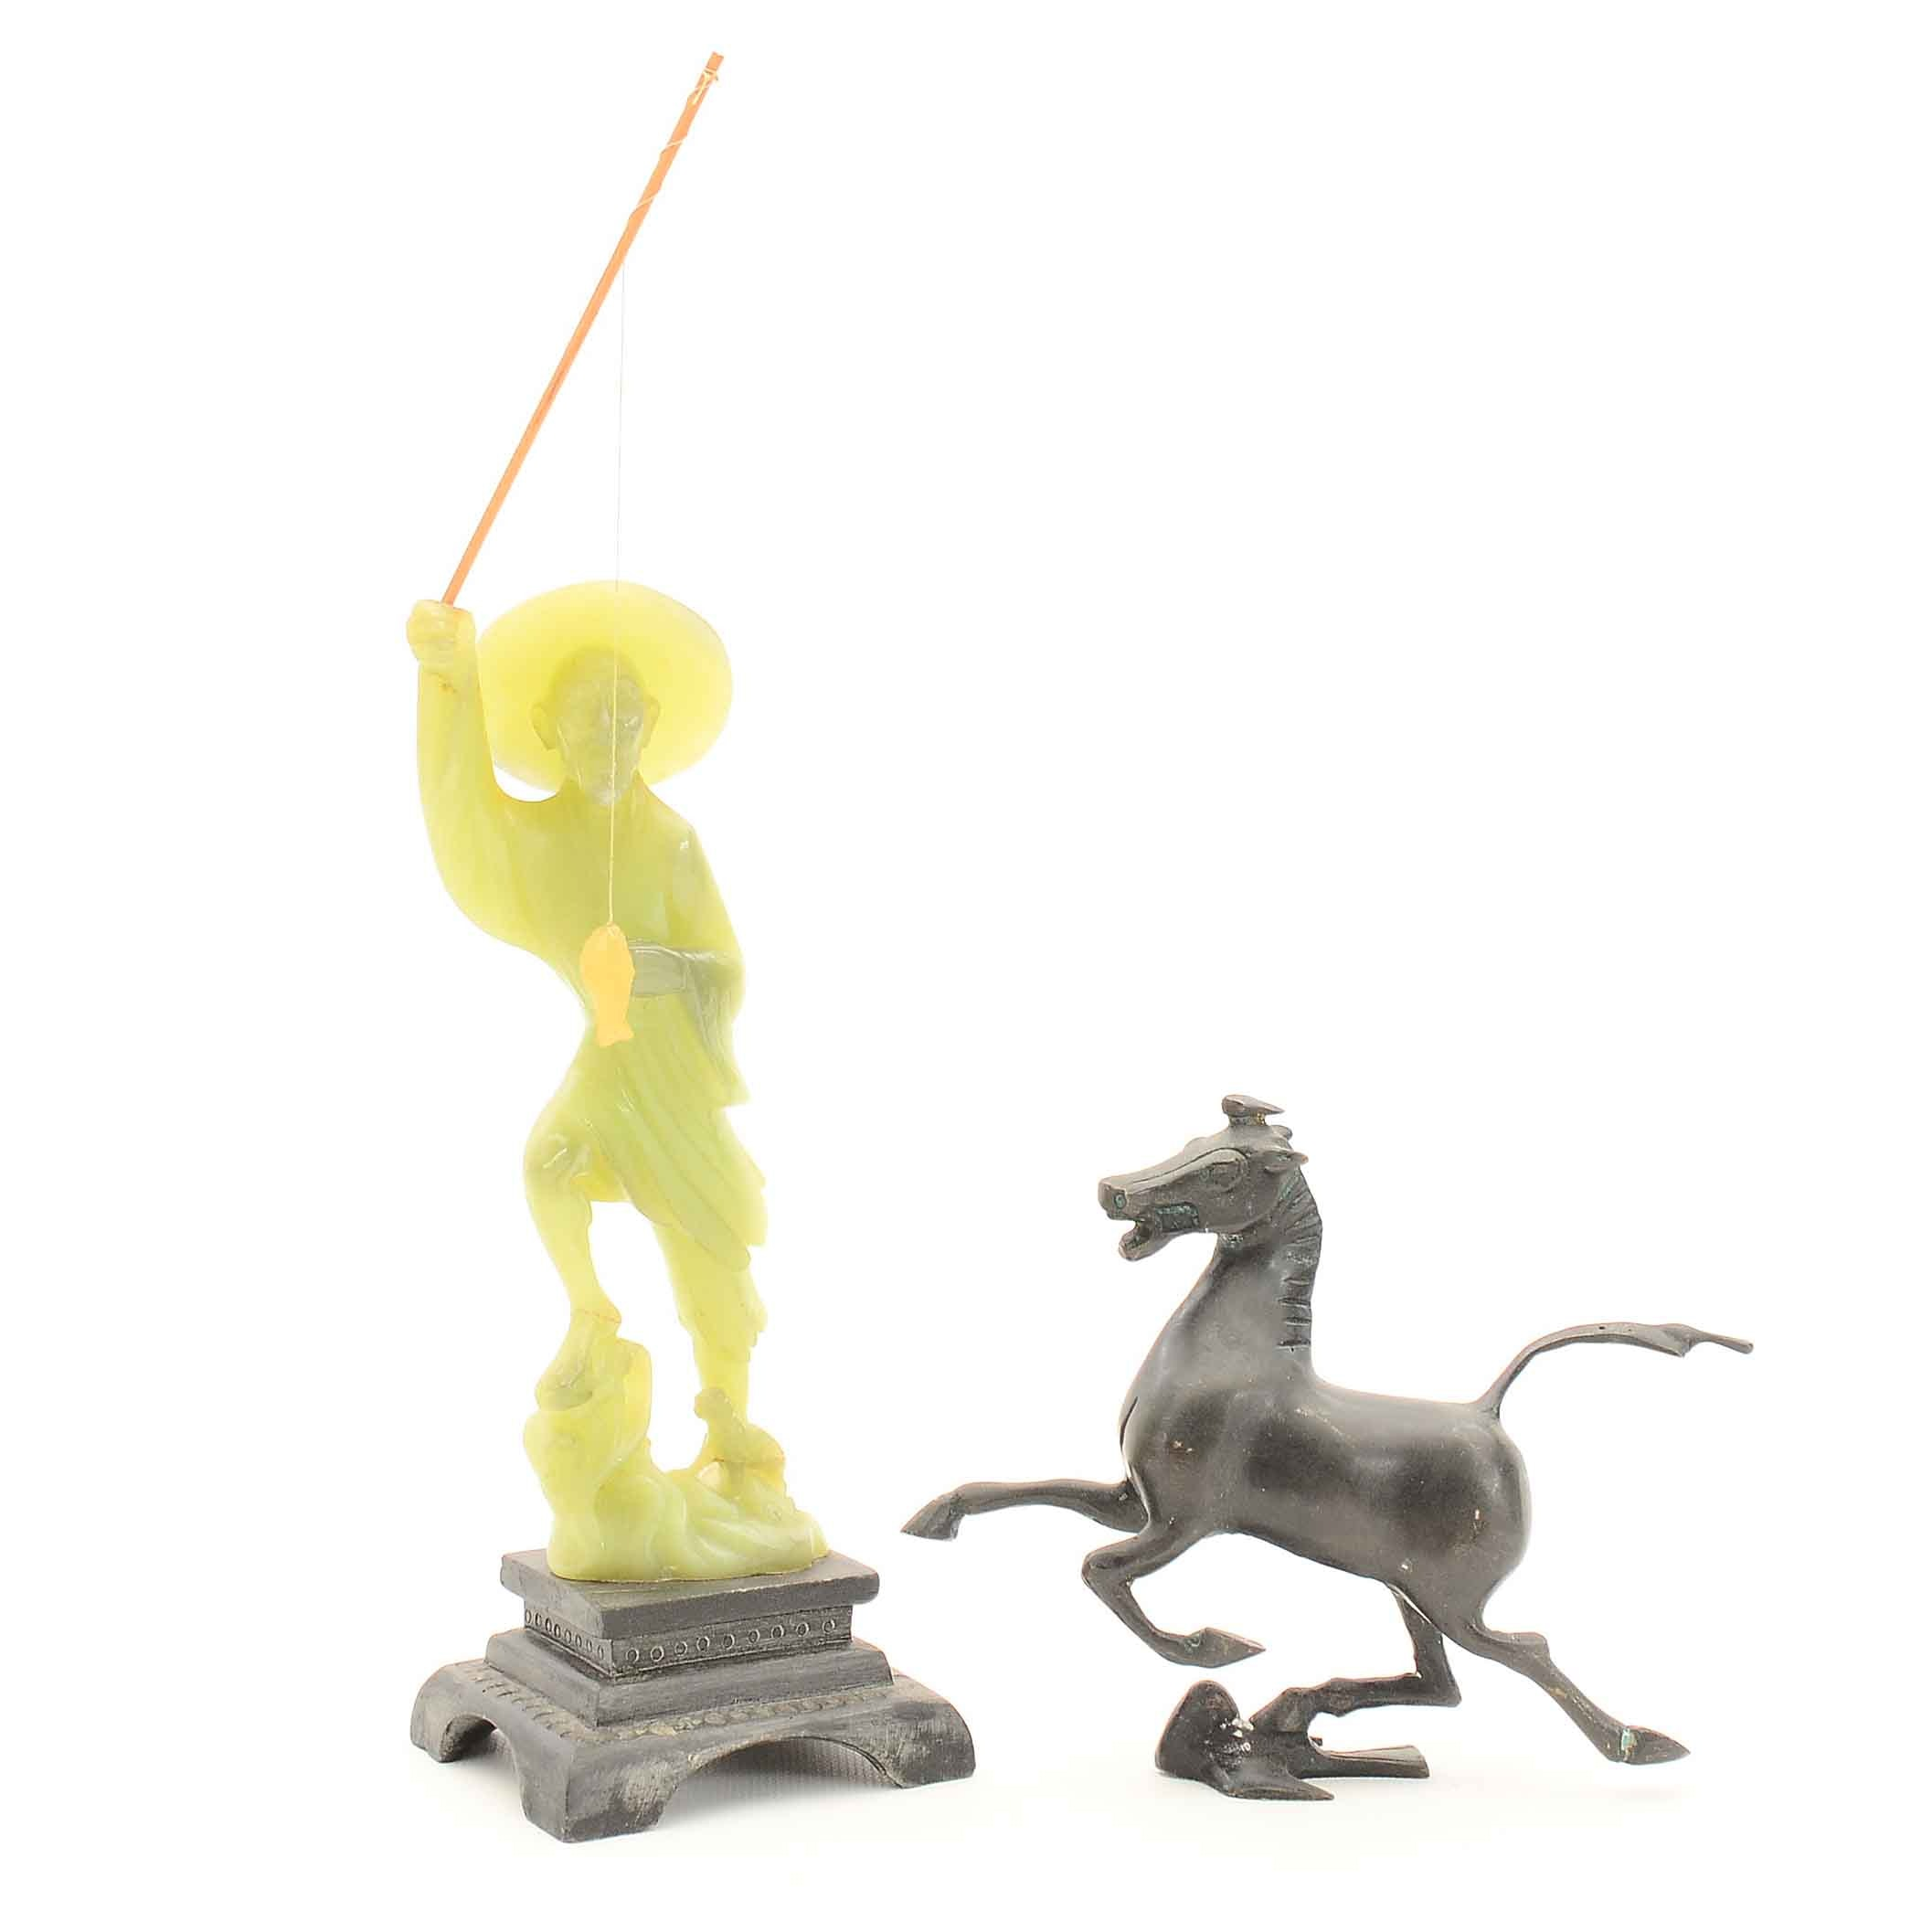 Chinese Decorative Figurines